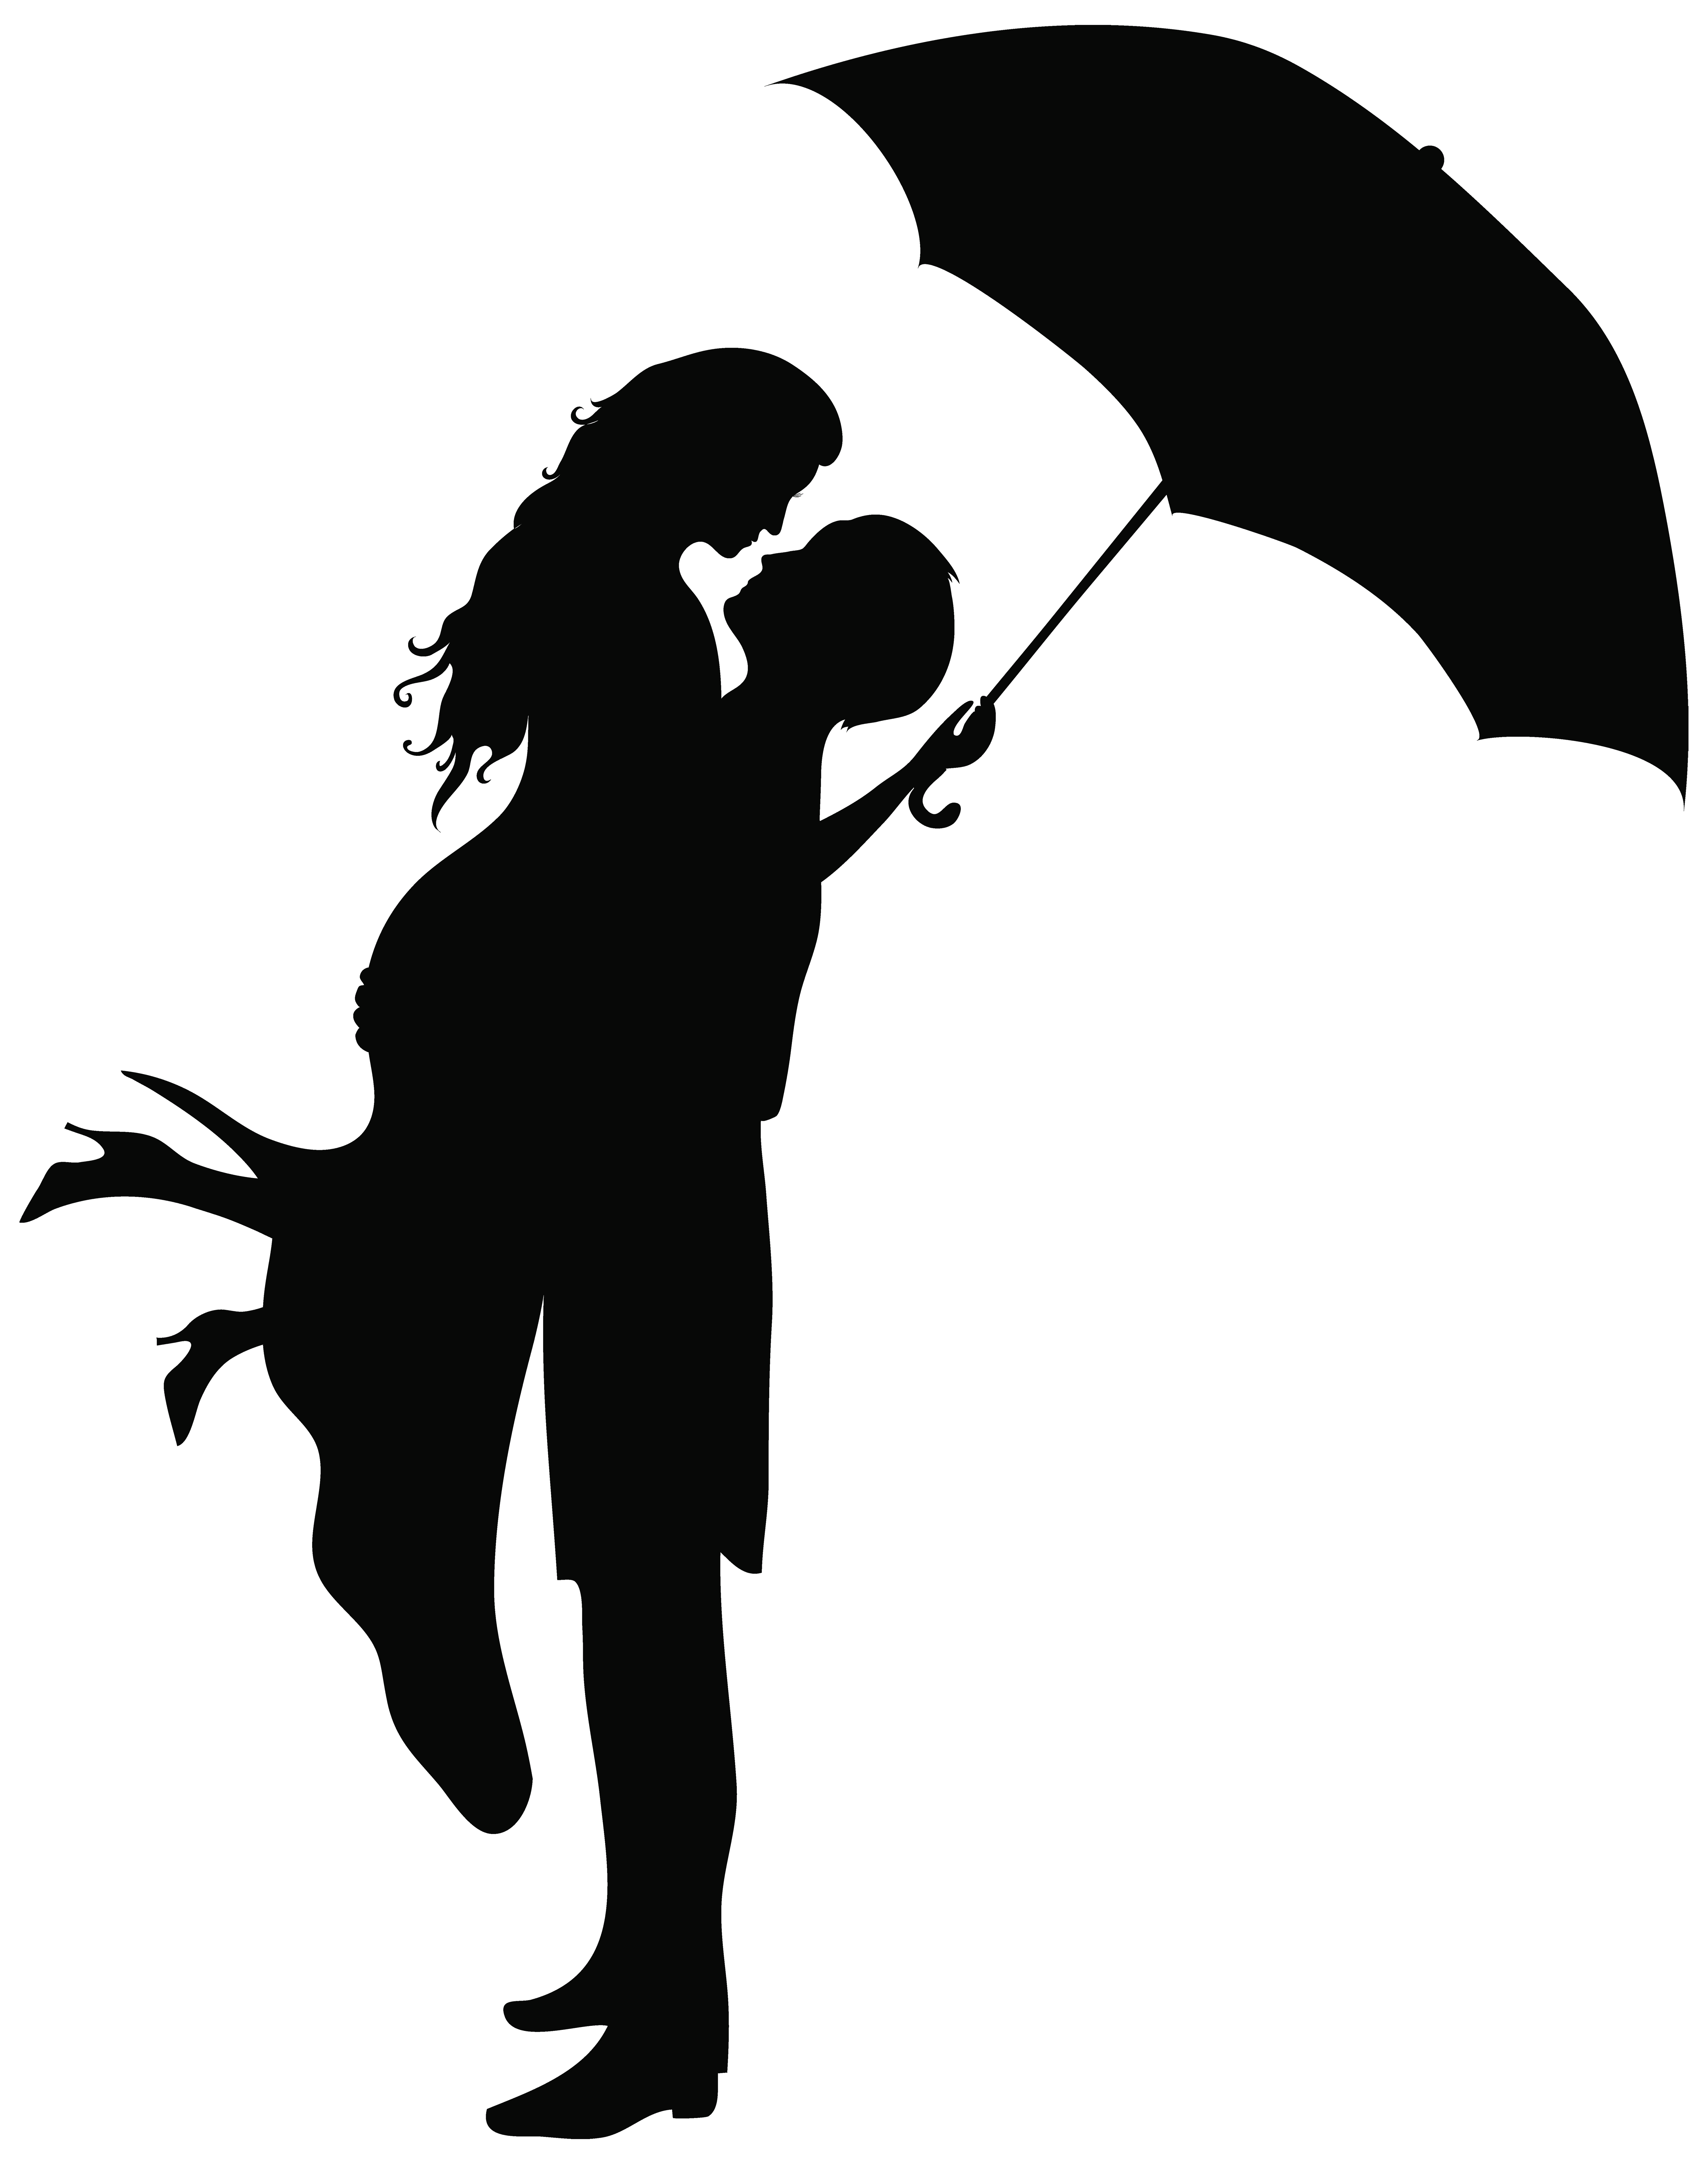 6315x8000 Romantic Couple Silhouettes Png Clip Art Imageu200b Gallery